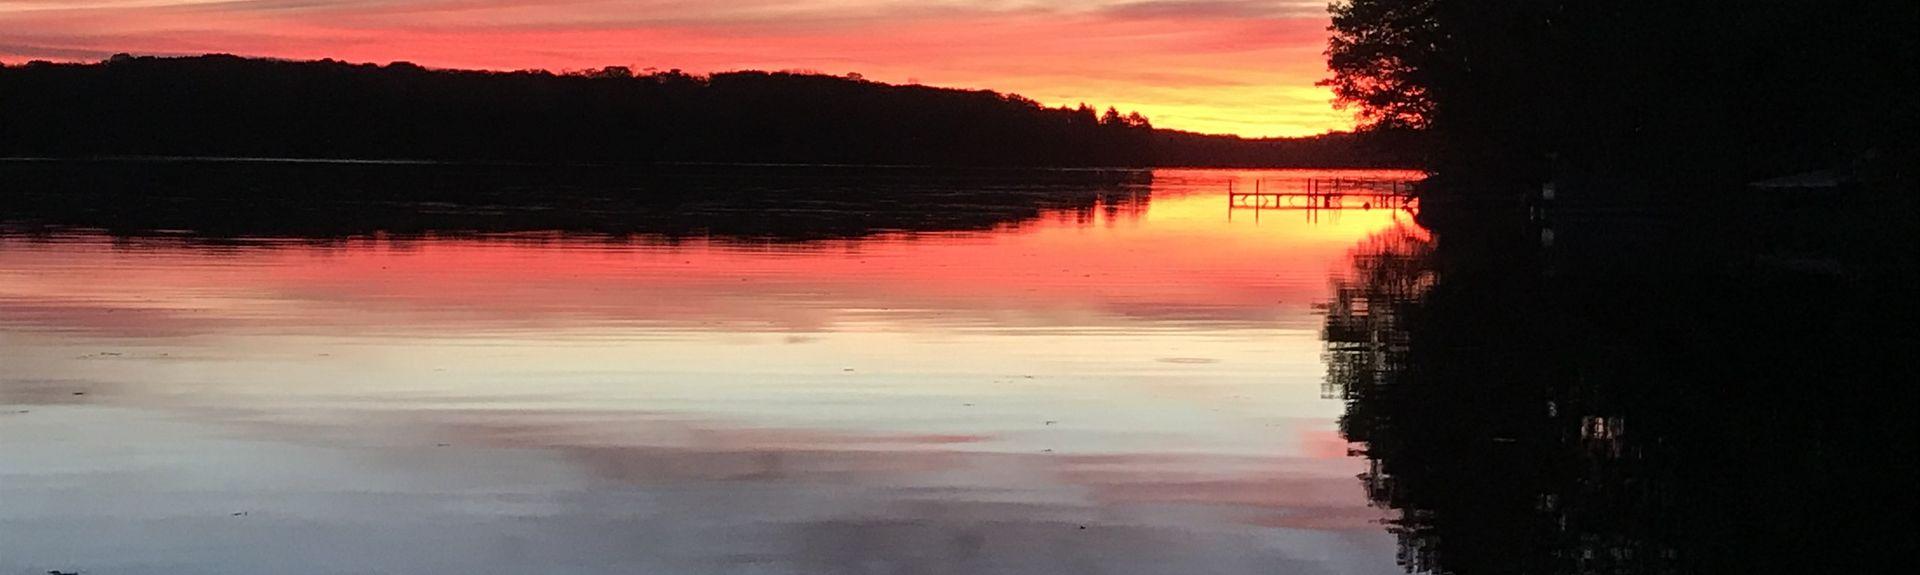 Stone Lake, WI, USA